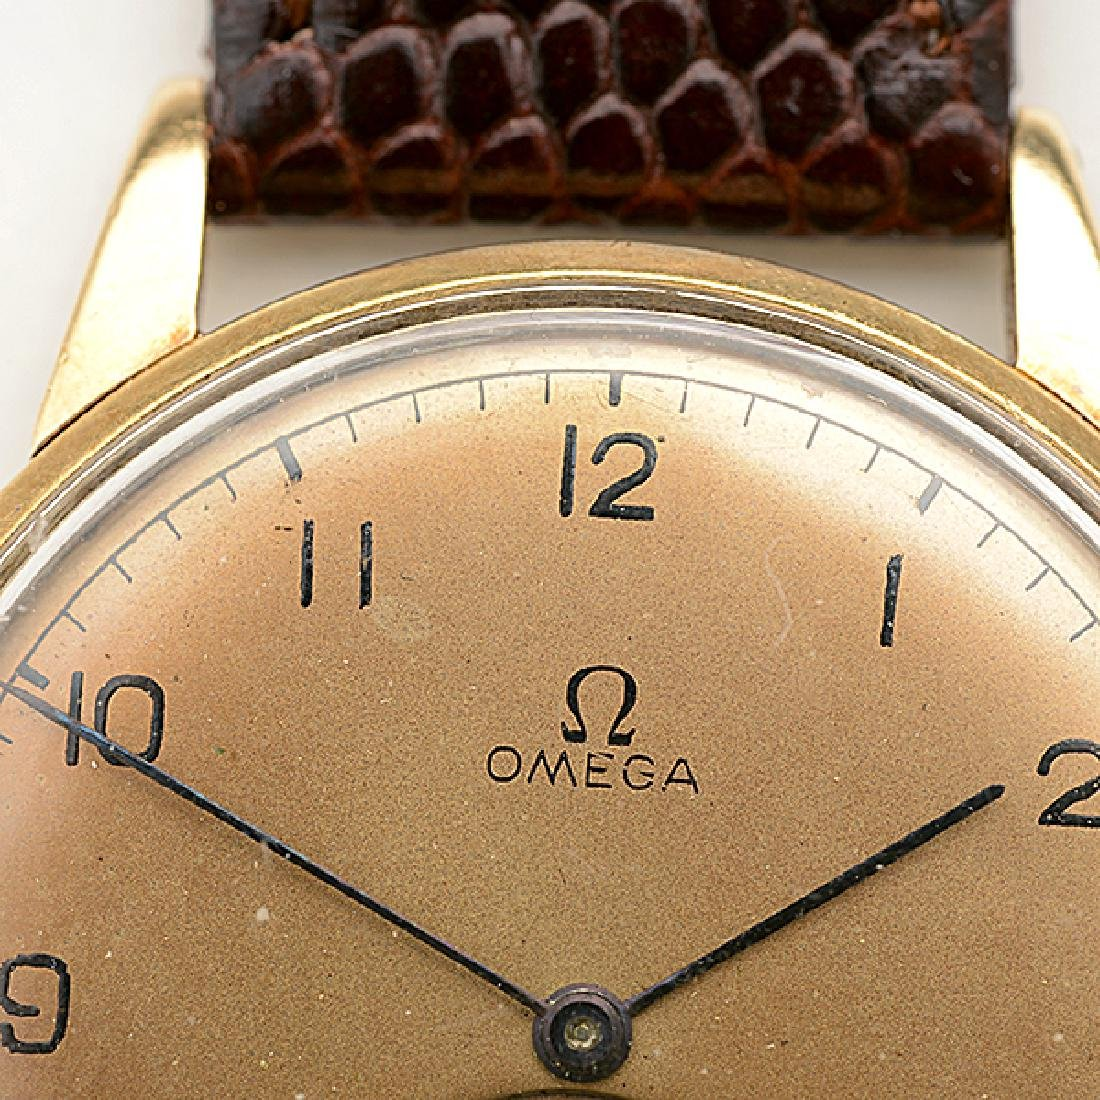 Omega 14k Yellow Gold, Leather, Metal Wristwatch. - 2